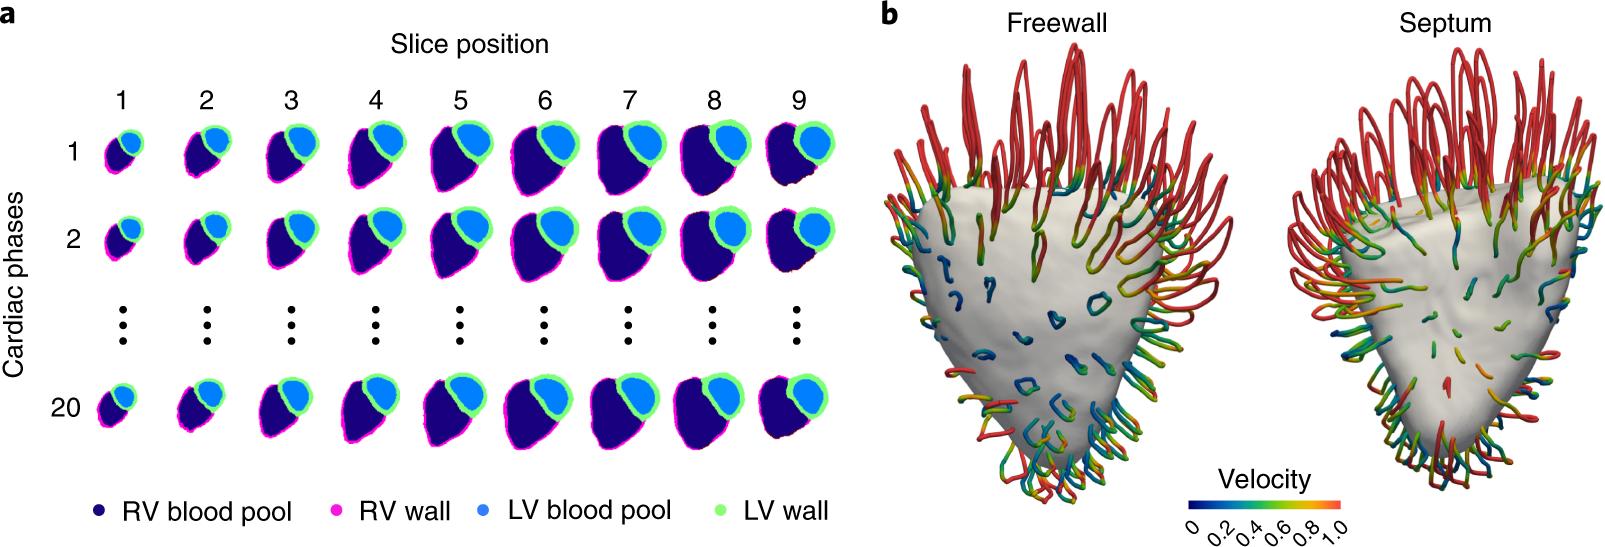 Deep-learning cardiac motion analysis for human survival prediction